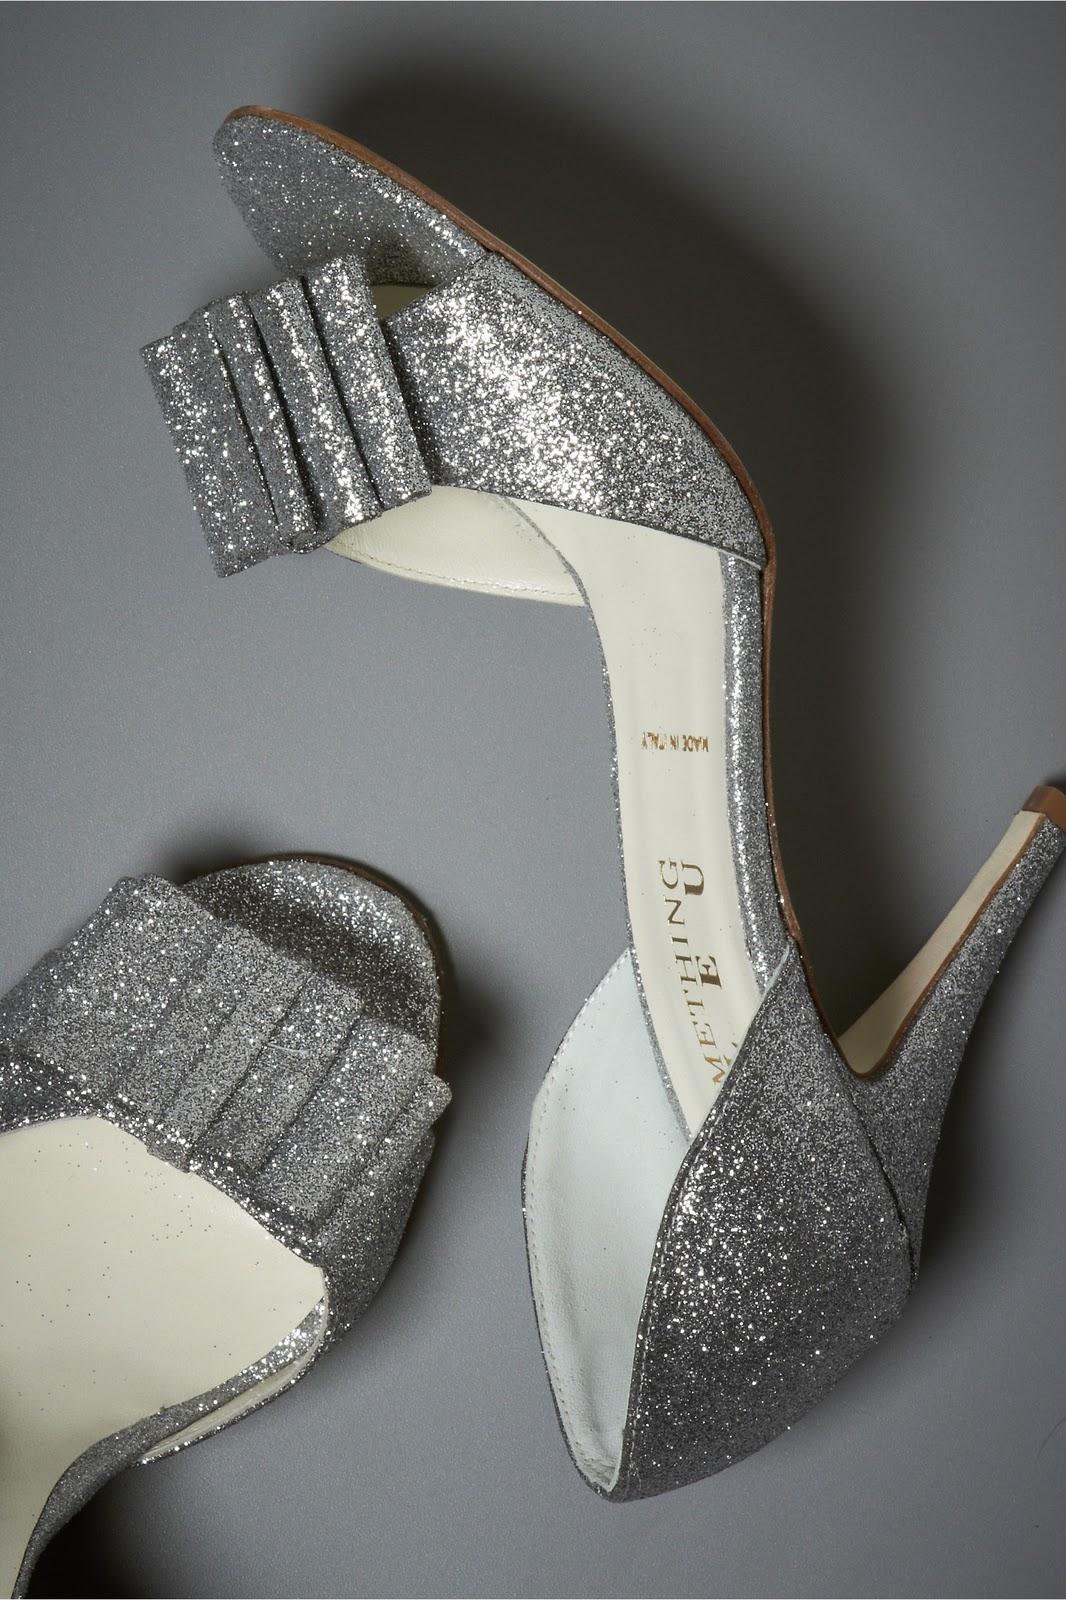 21062922 007 a - Boncuk ��lemeli Elbise Modeli